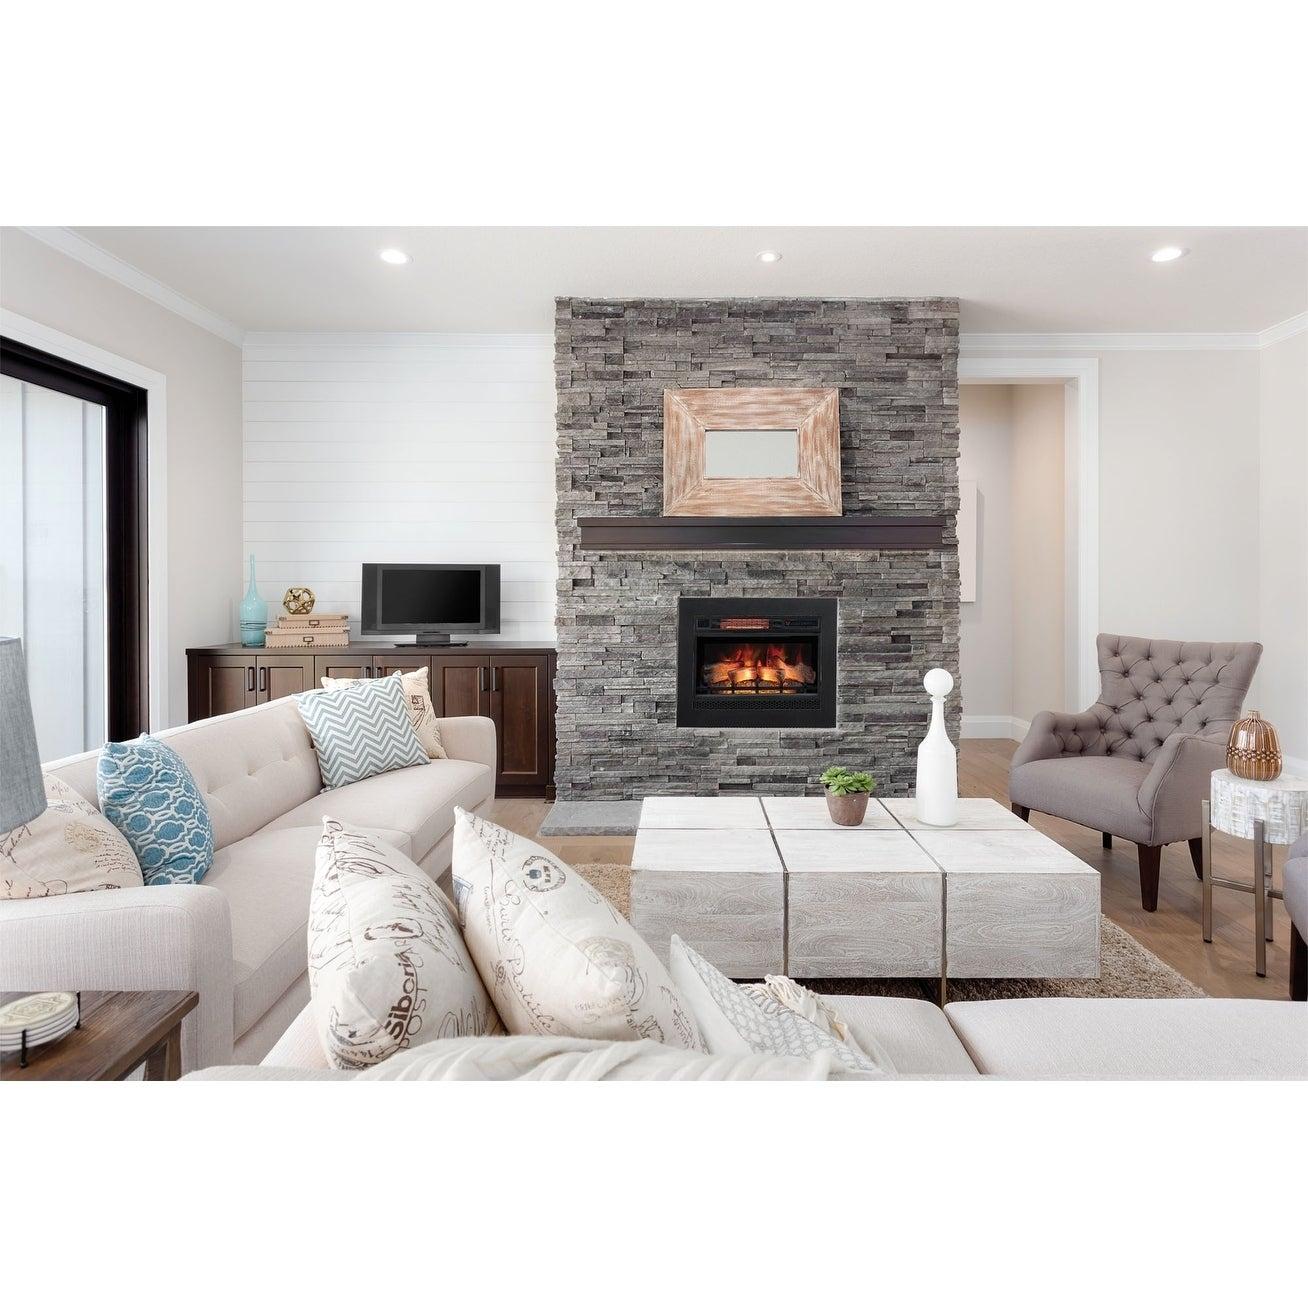 ClassicFlame 26 3D Infrared Quartz Electric Fireplace Insert 2e5276fe 9e71 40c0 882b 31ba ff